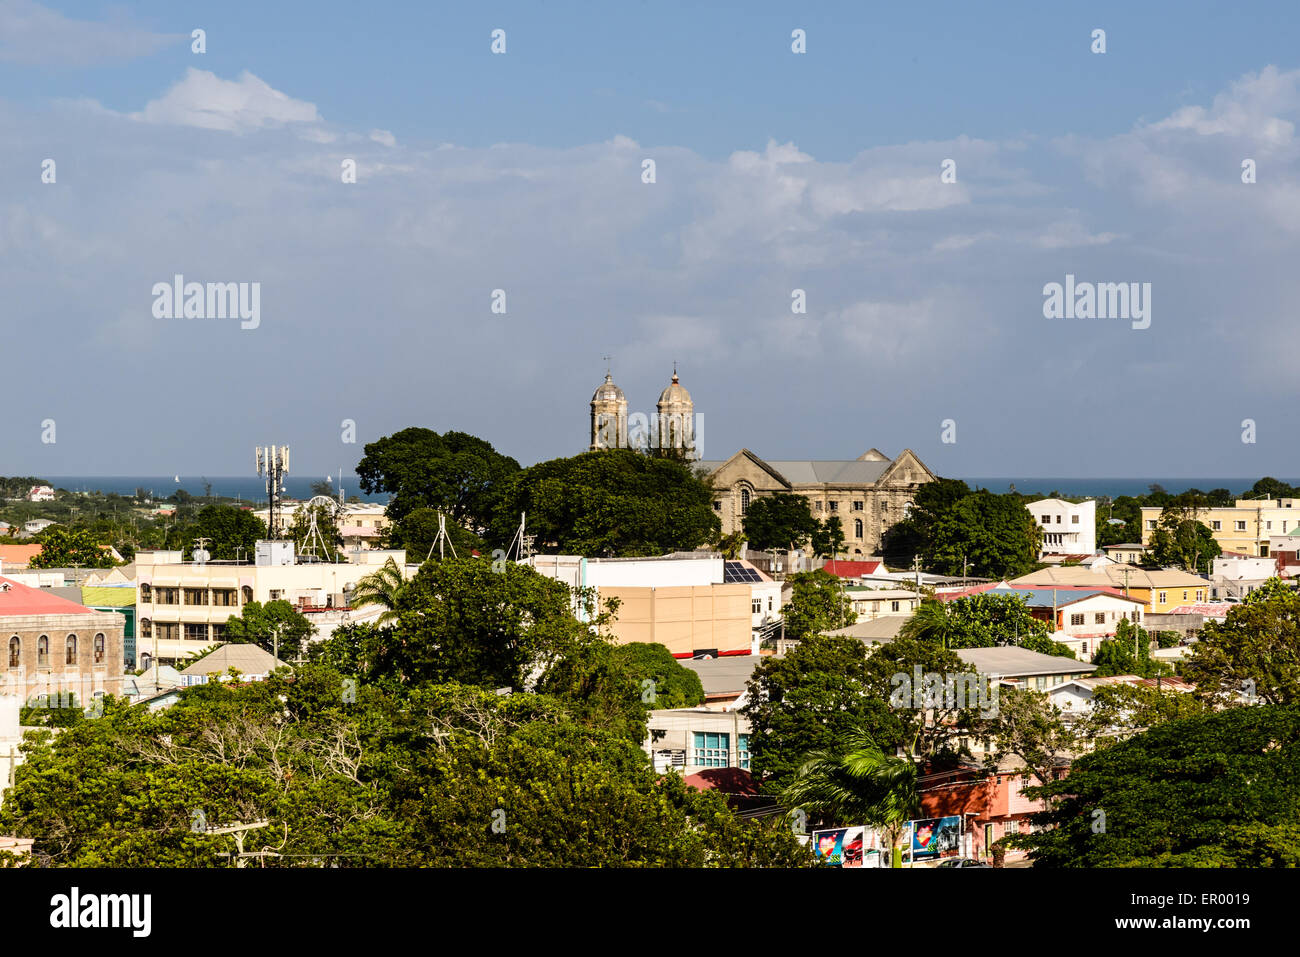 St. John the Divine Cathedral, Saint John's, Antigua - Stock Image